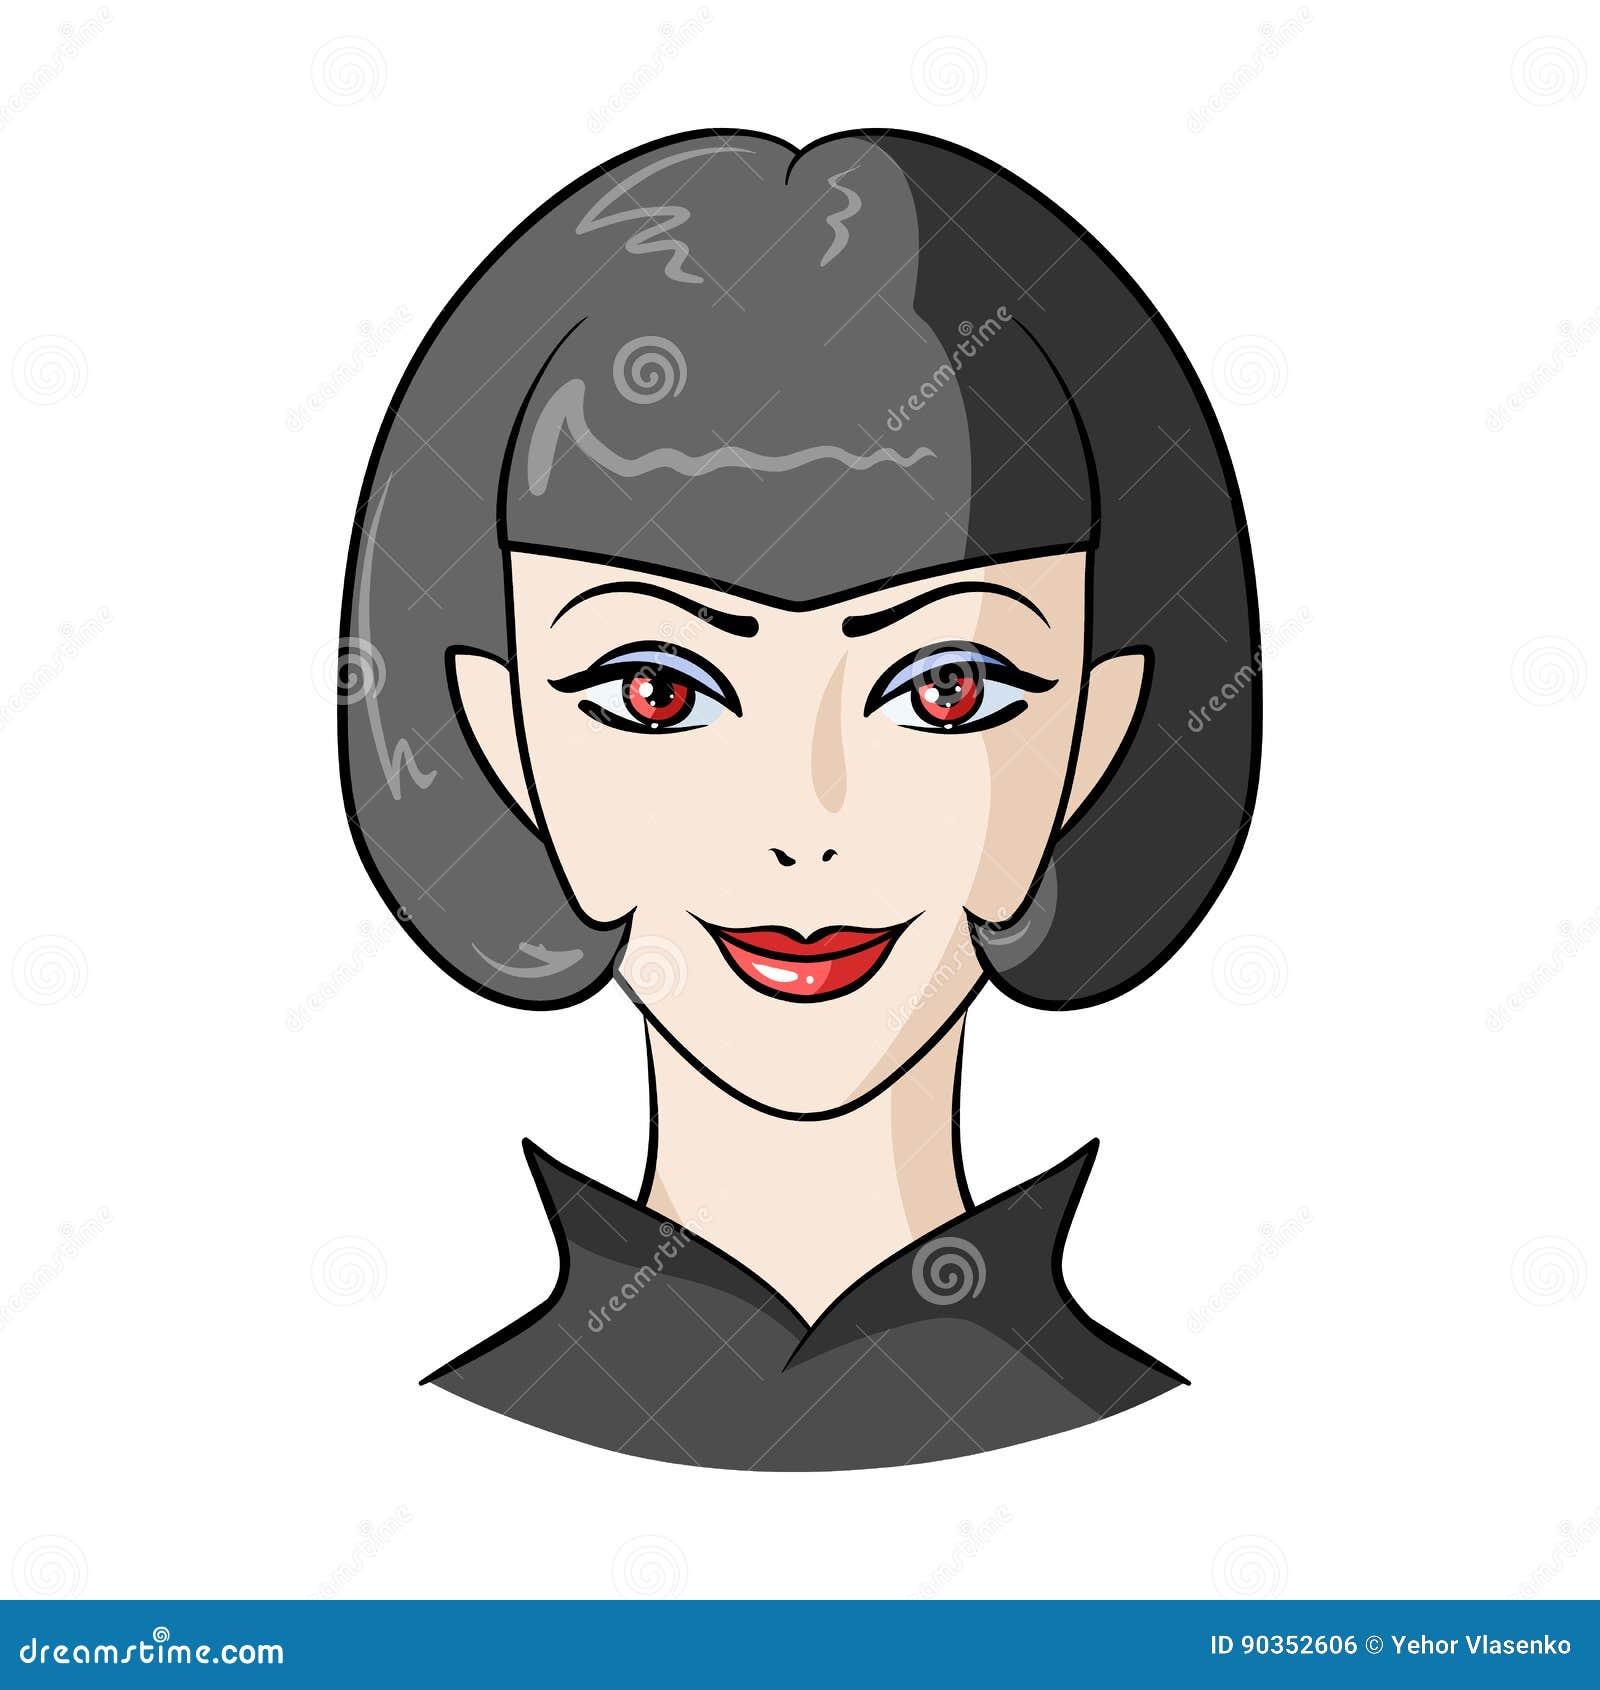 Avatar Girl With Short Hair Avatar And Face Single Icon In Cartoon